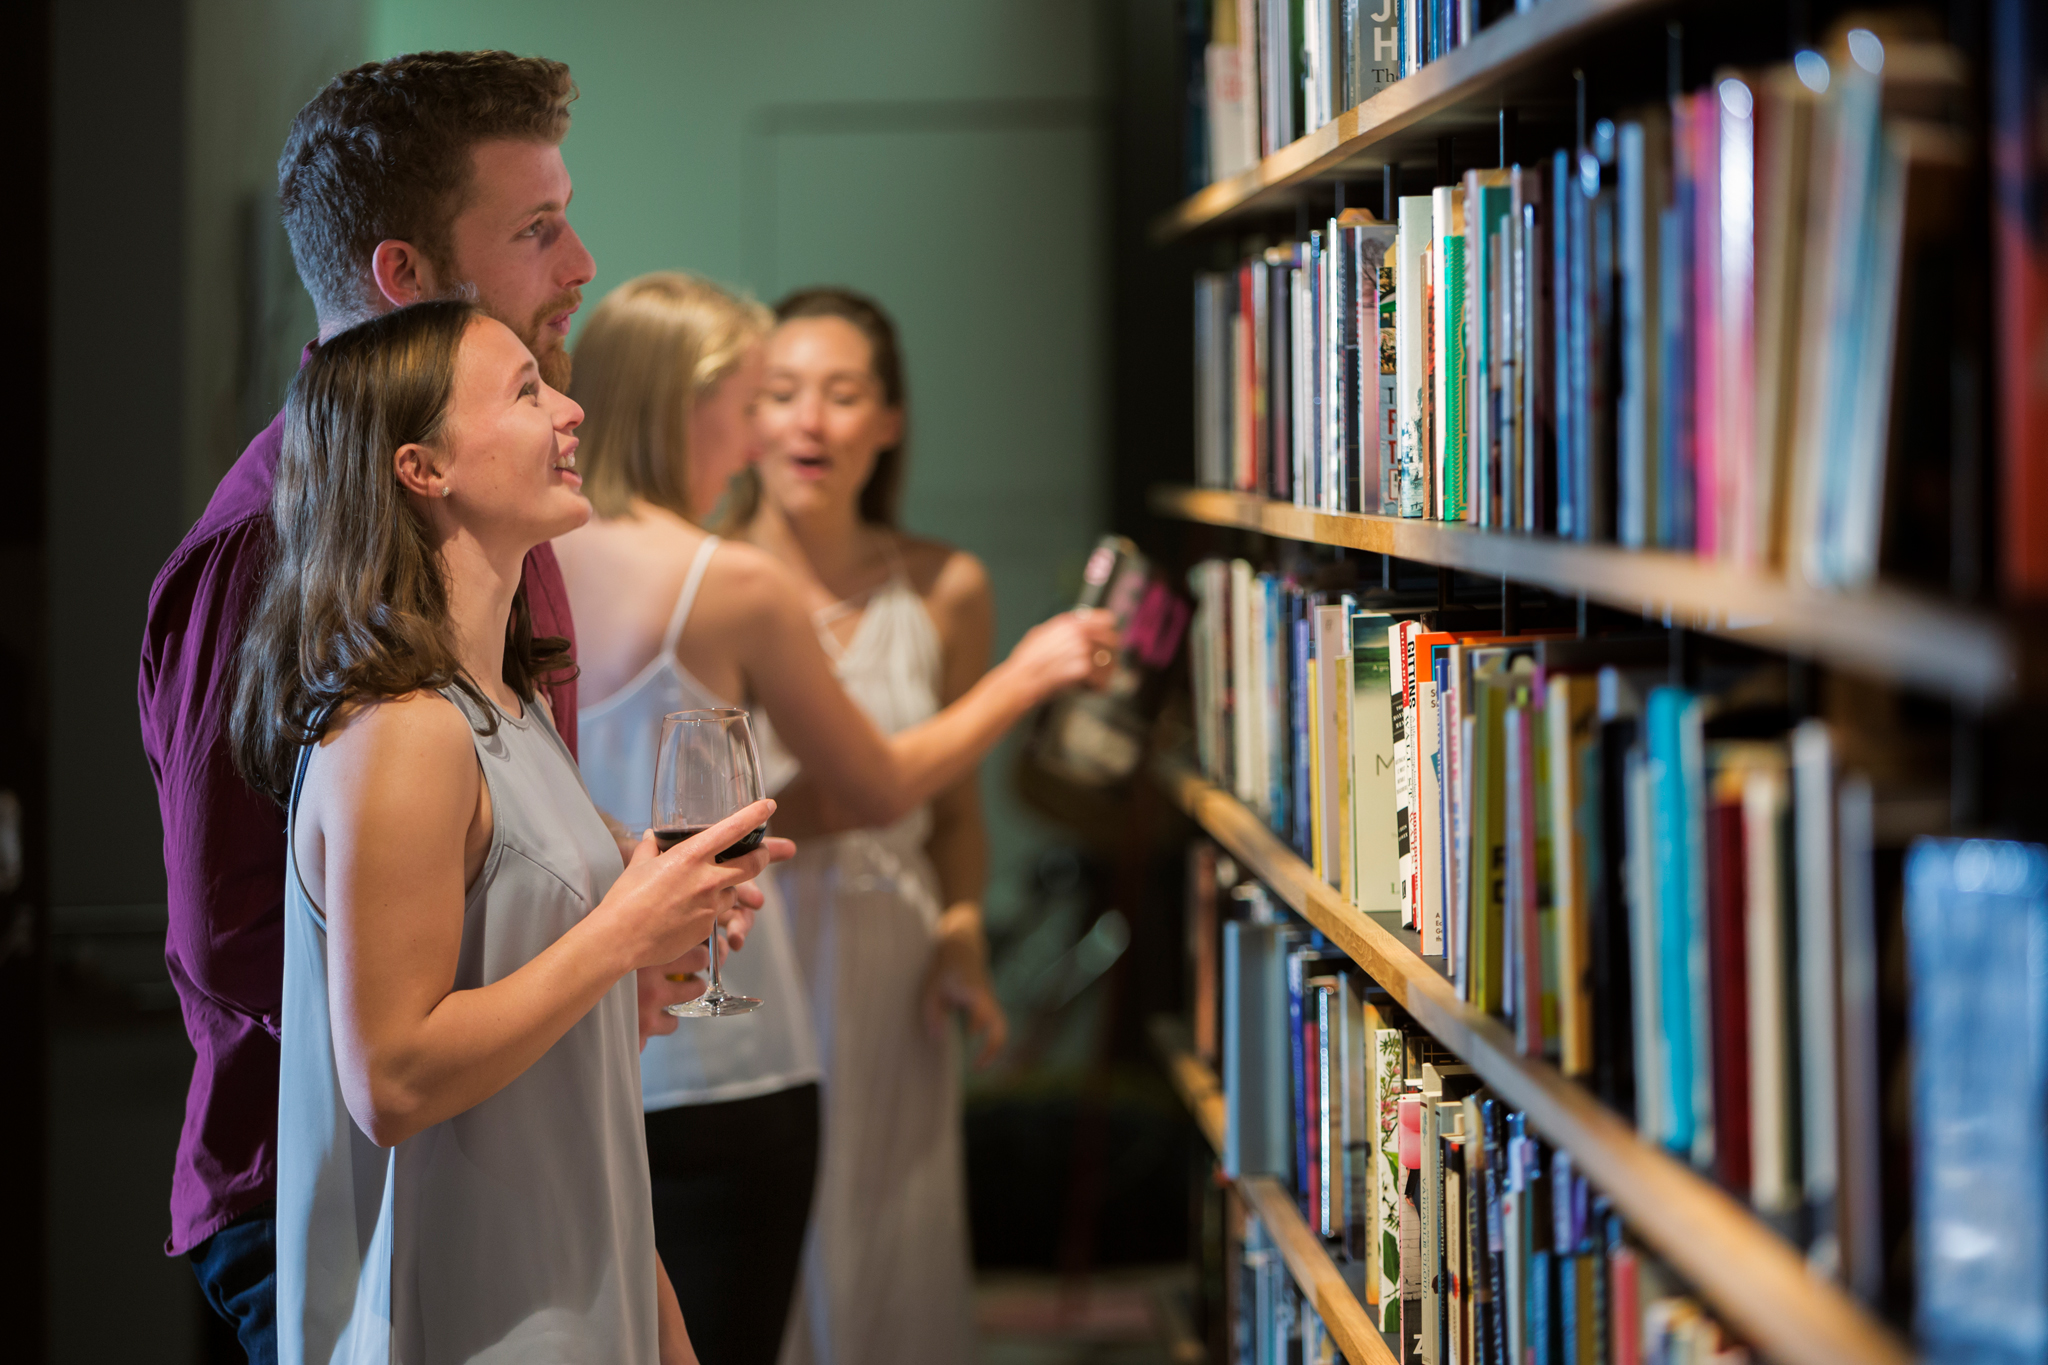 Drink wine in a bookshop